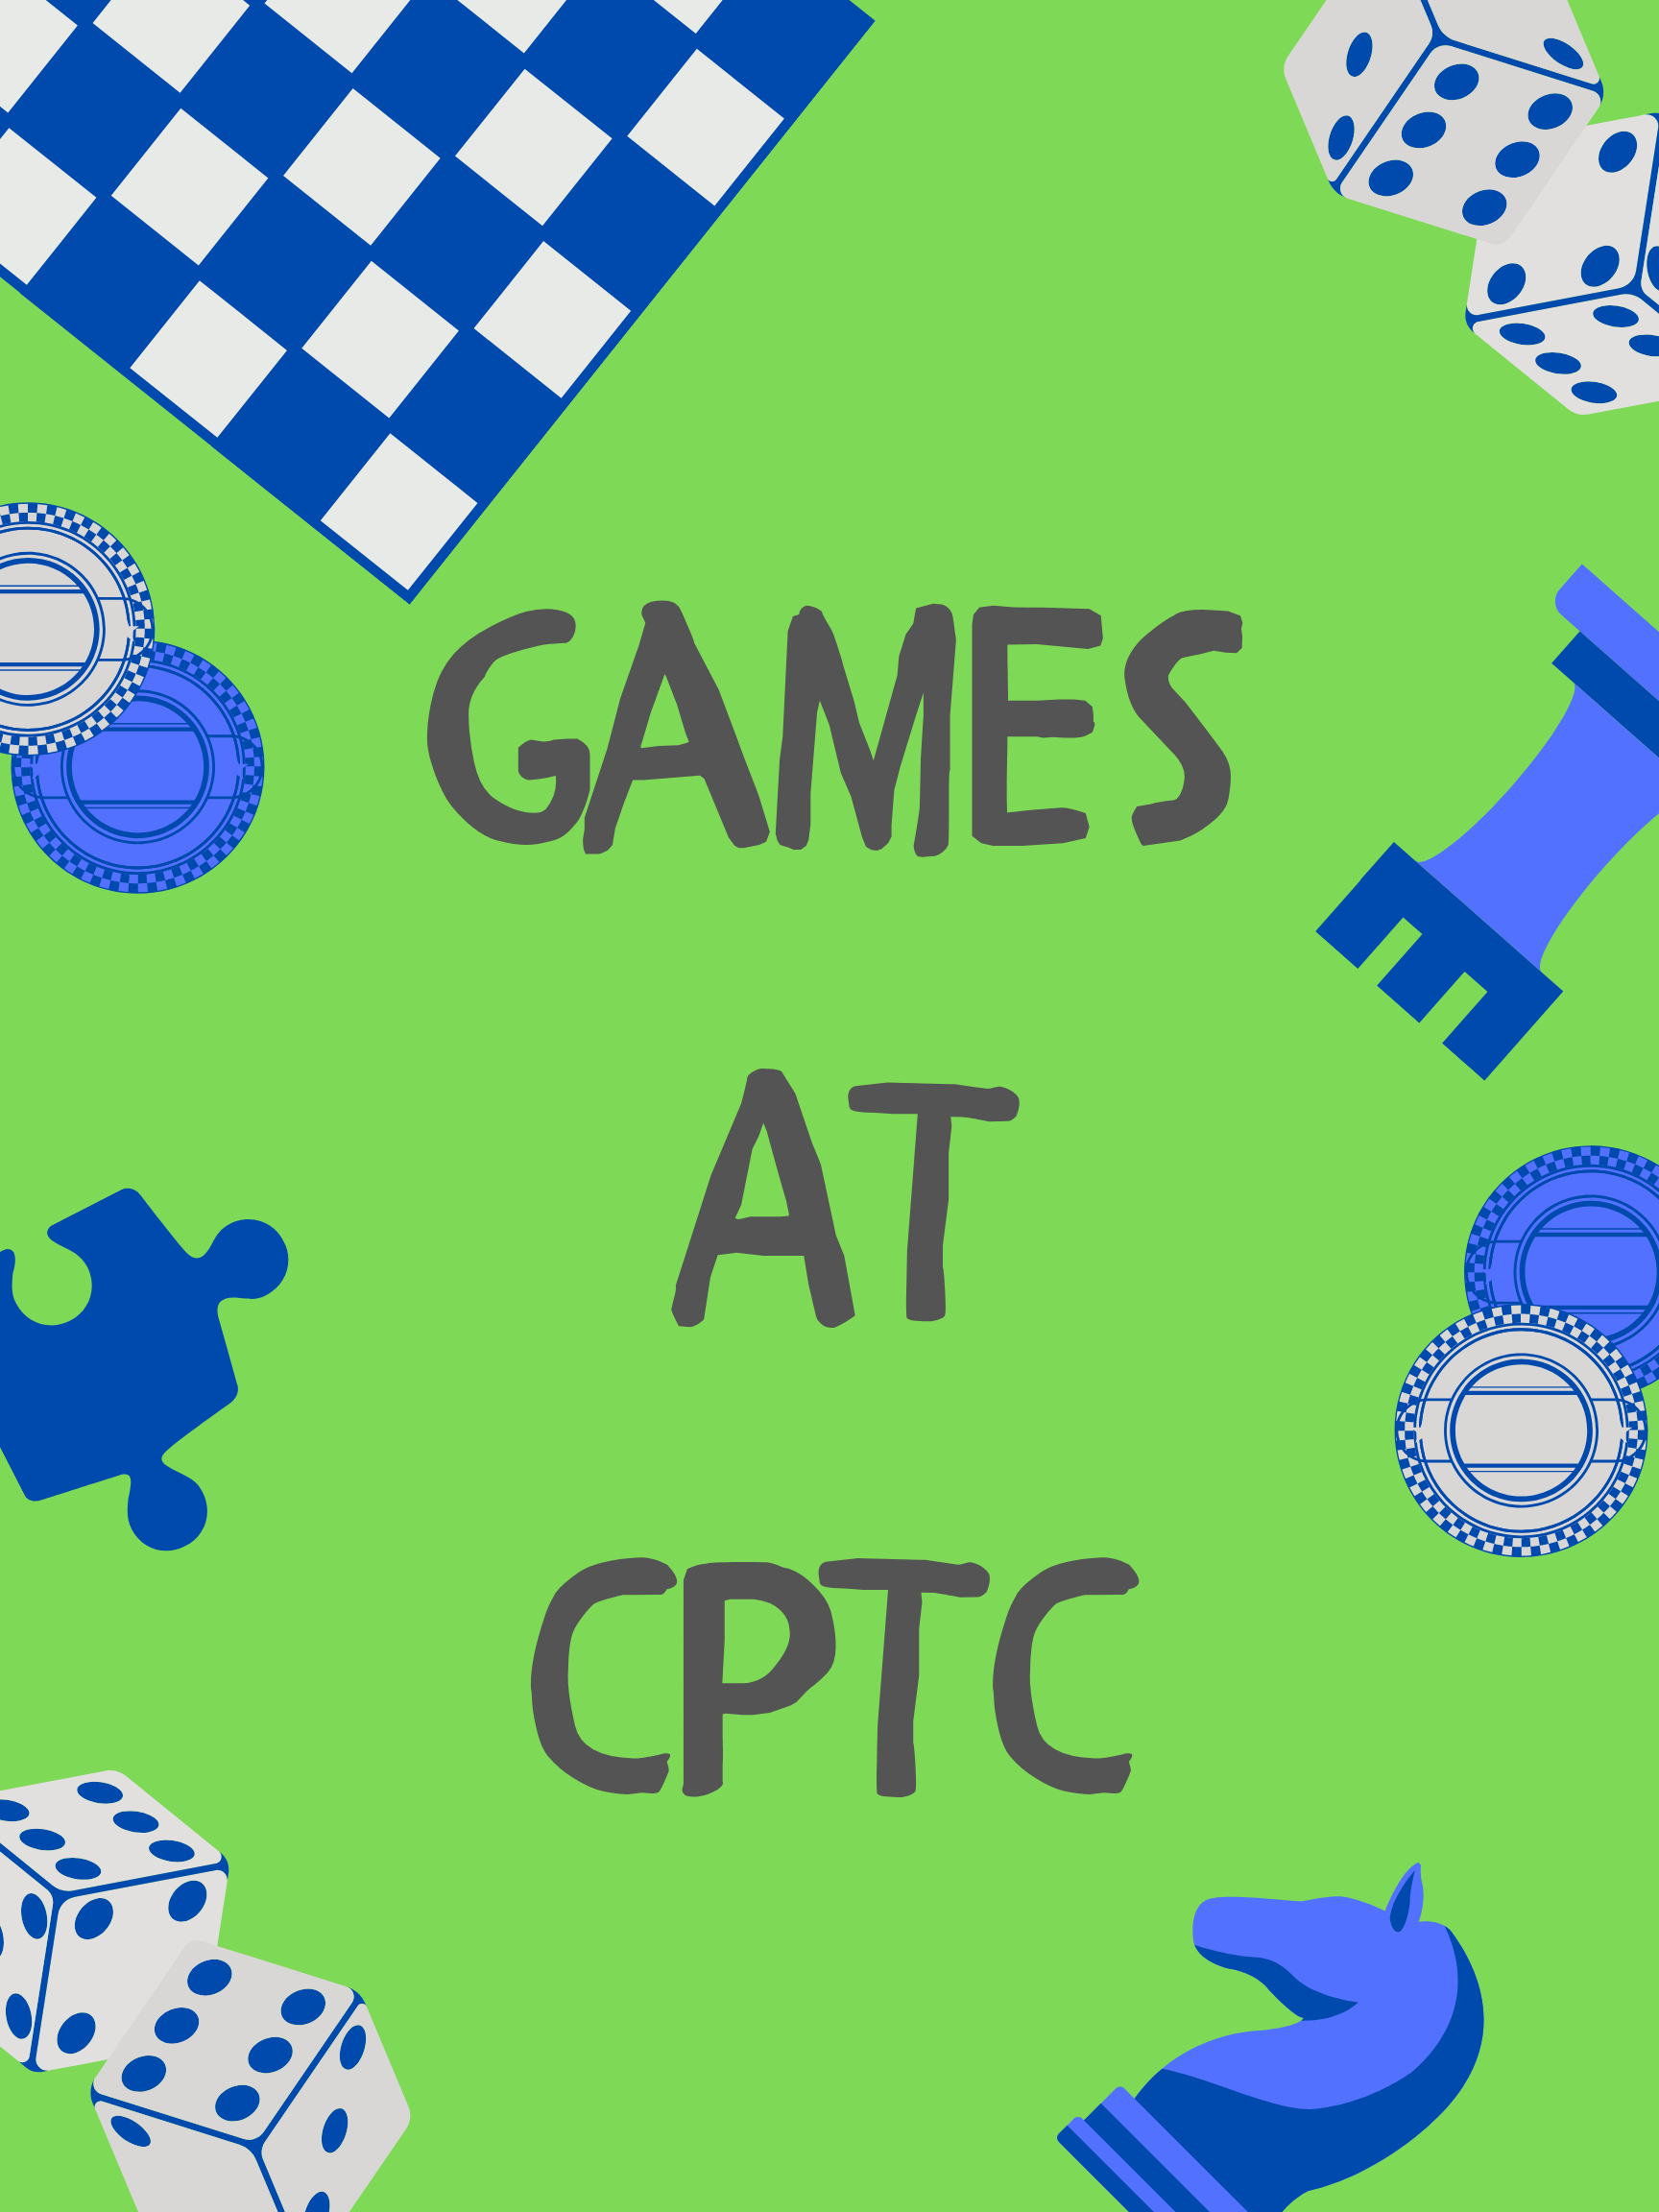 Games at CPTC